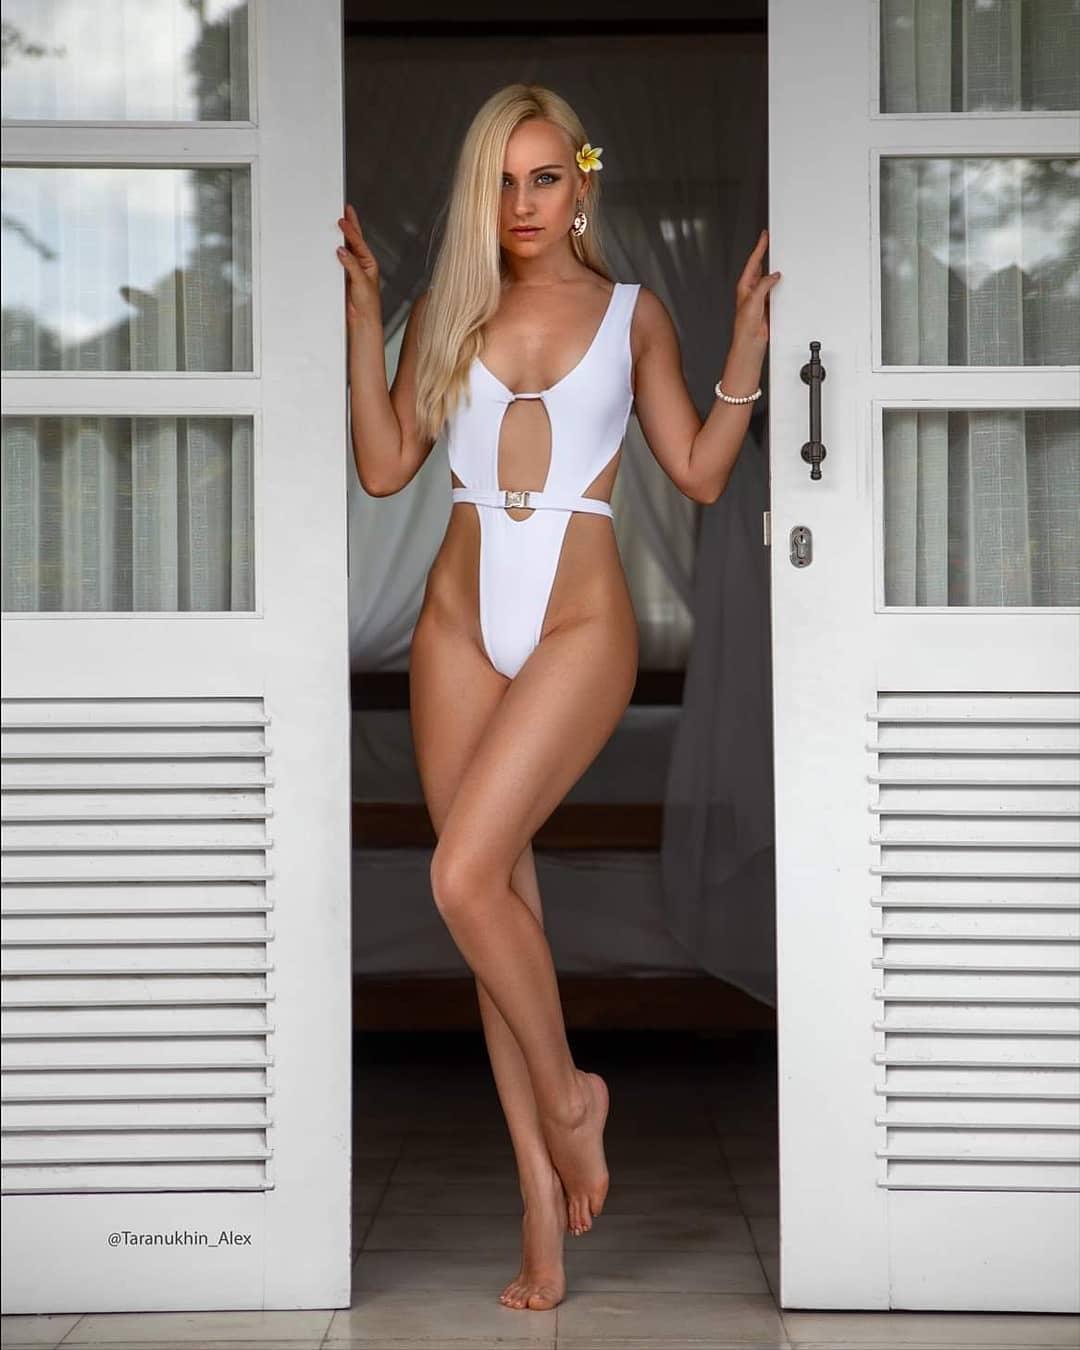 evgenia taranukhina's sexy bikini